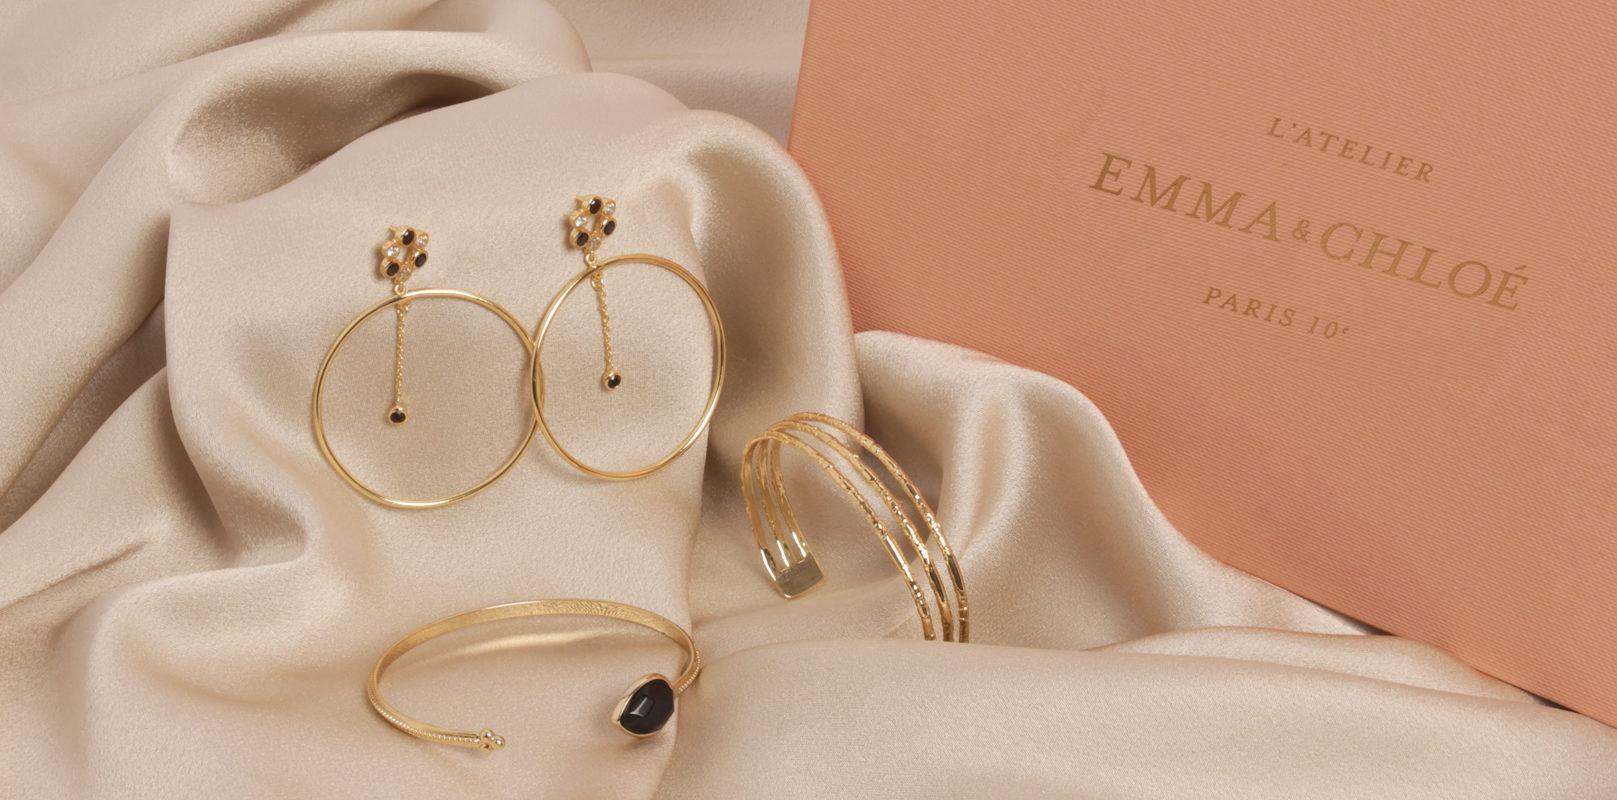 emma et chloé box bijoux